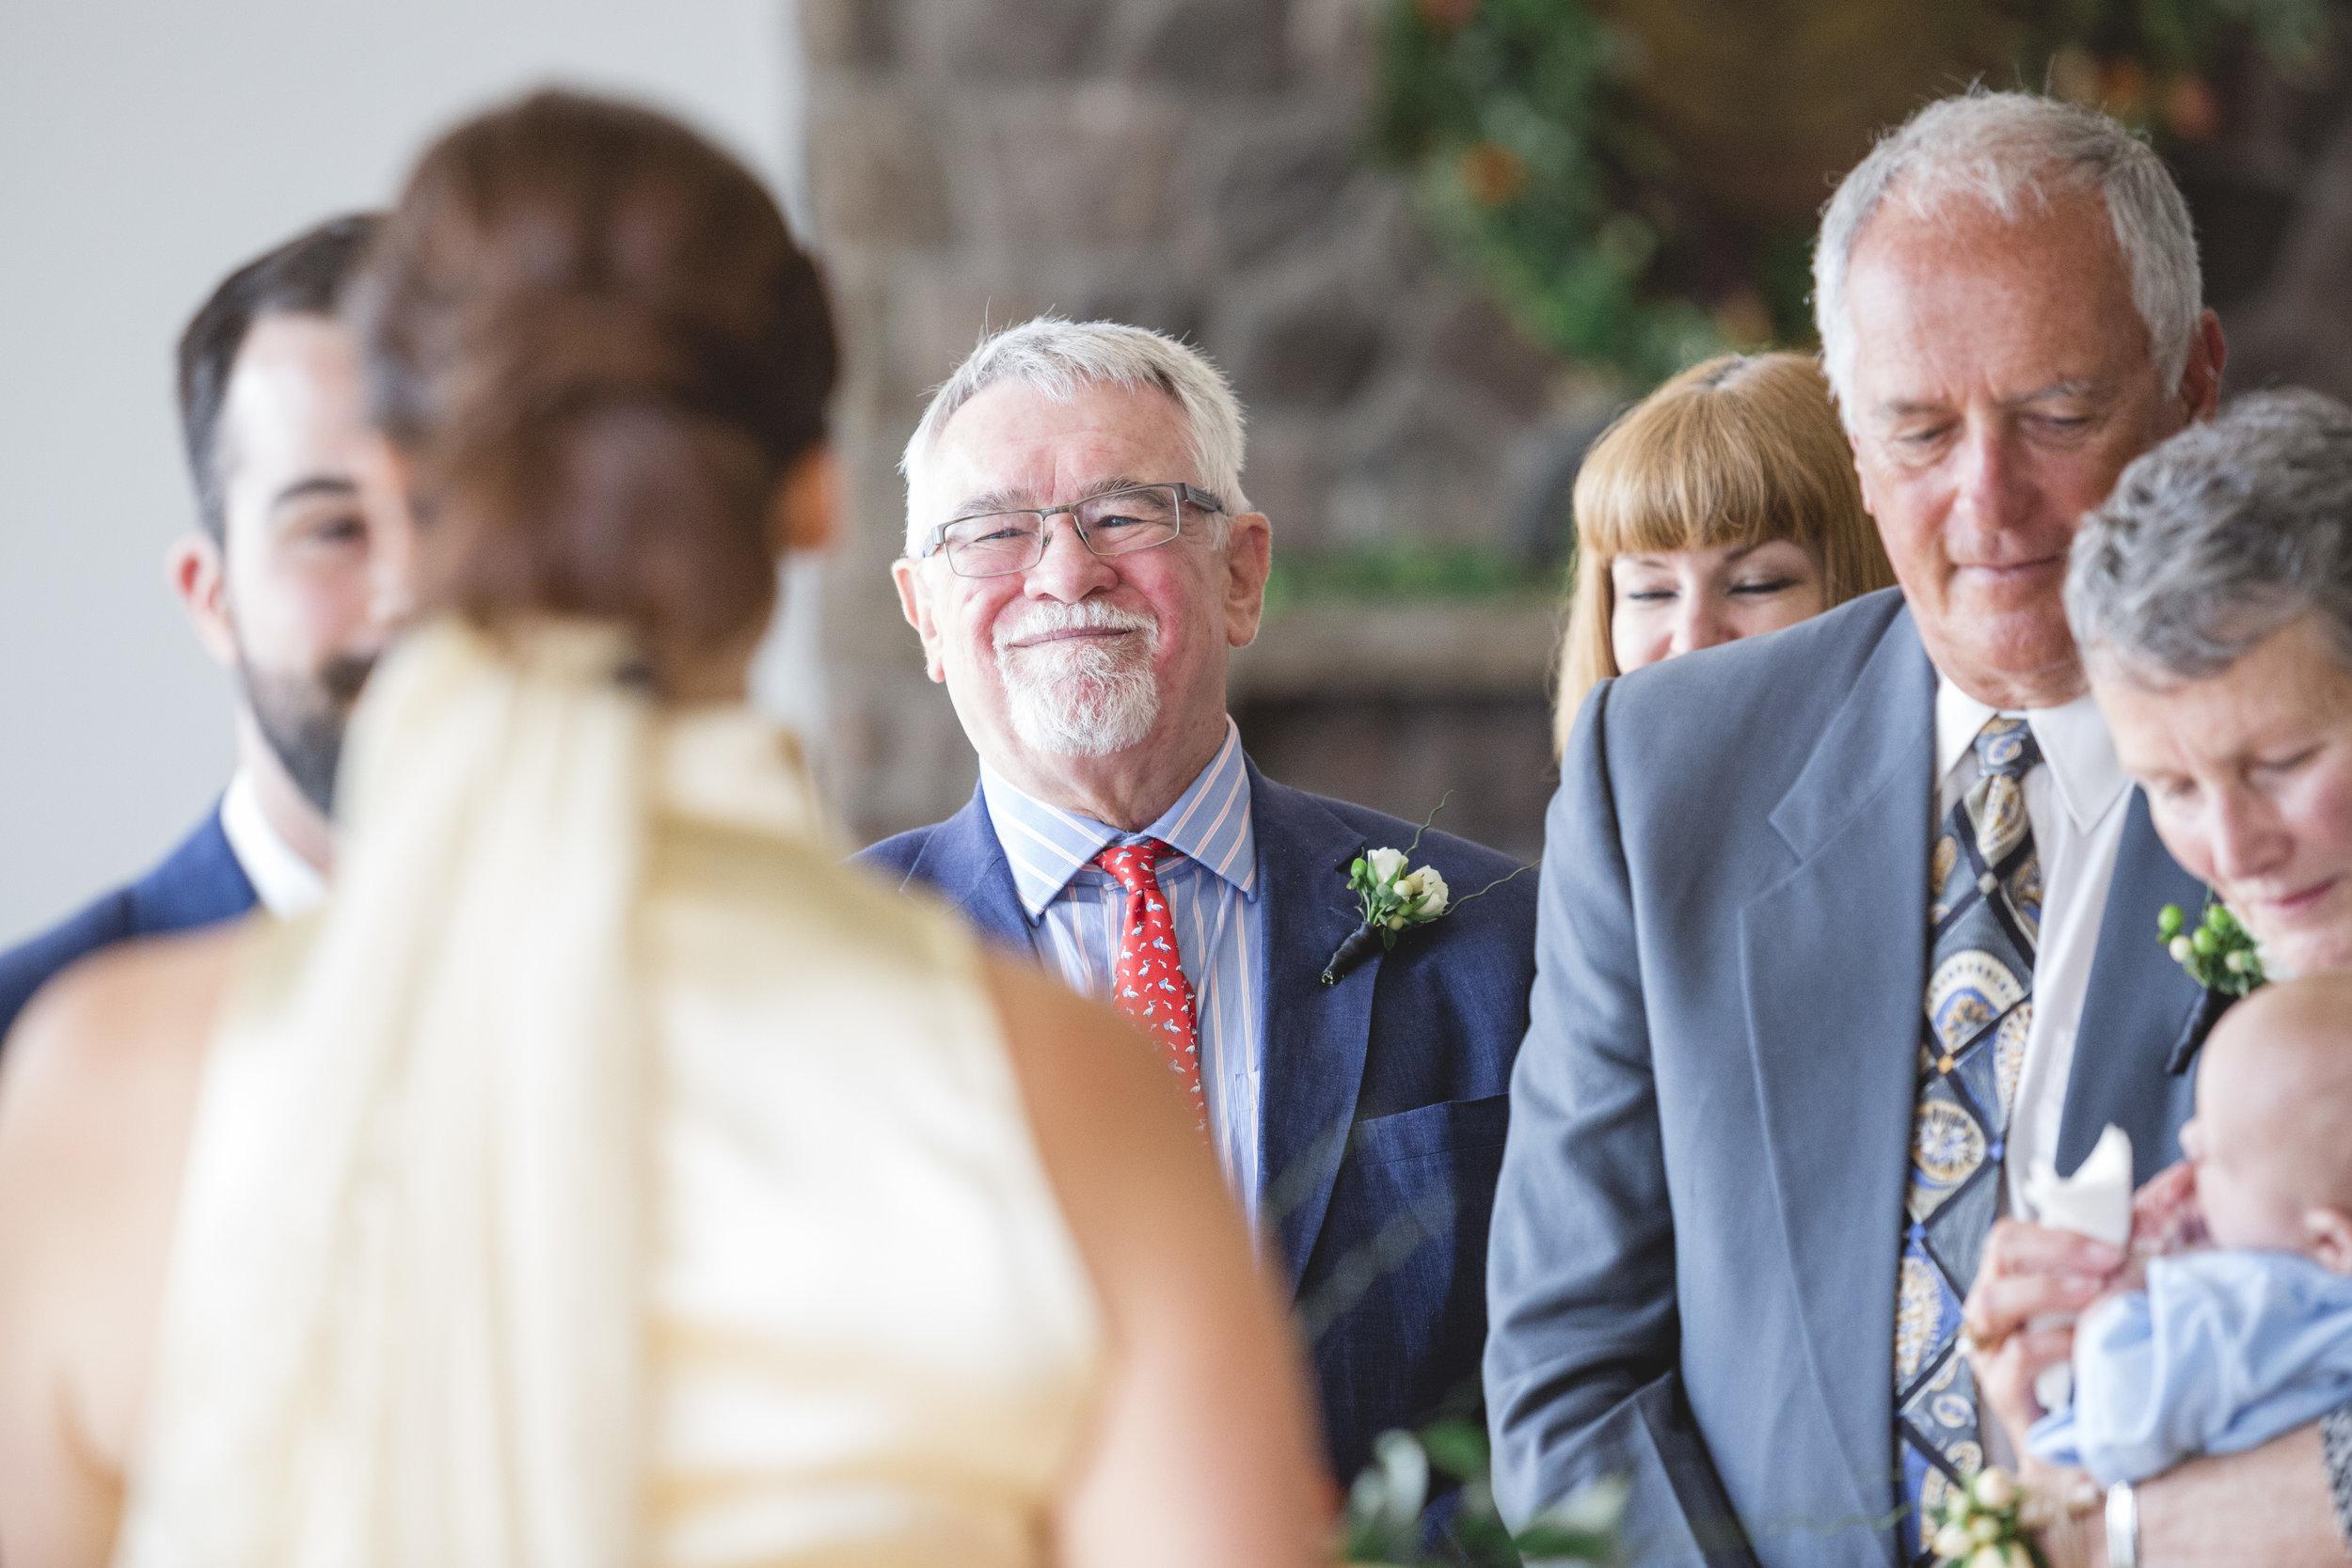 Wedding Ceremony Inside the Toronto Argonaut Rowing Club